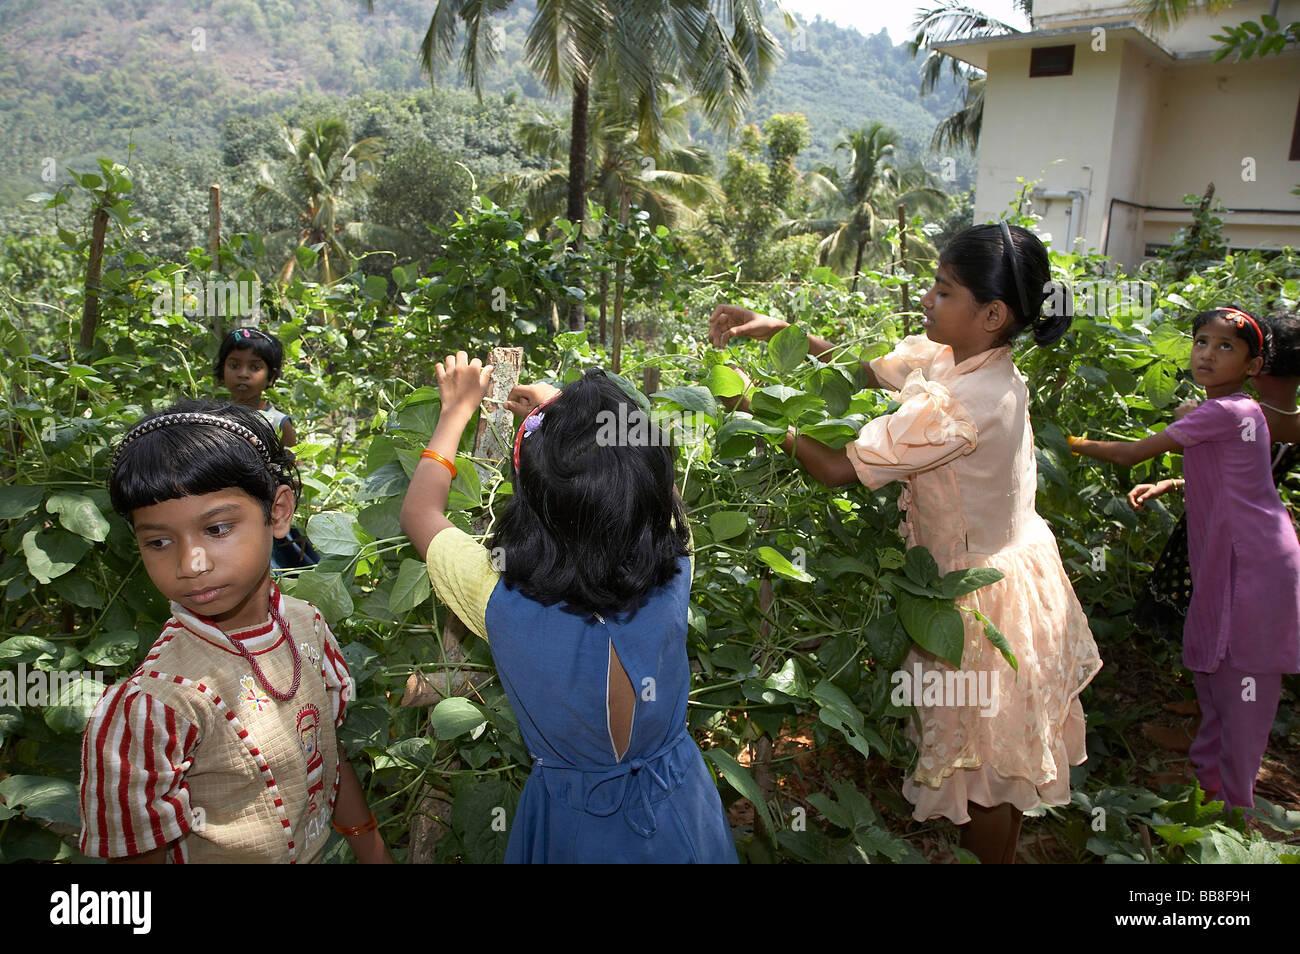 Painet jq3520 india girls woking in vegatble plot mary matha bala